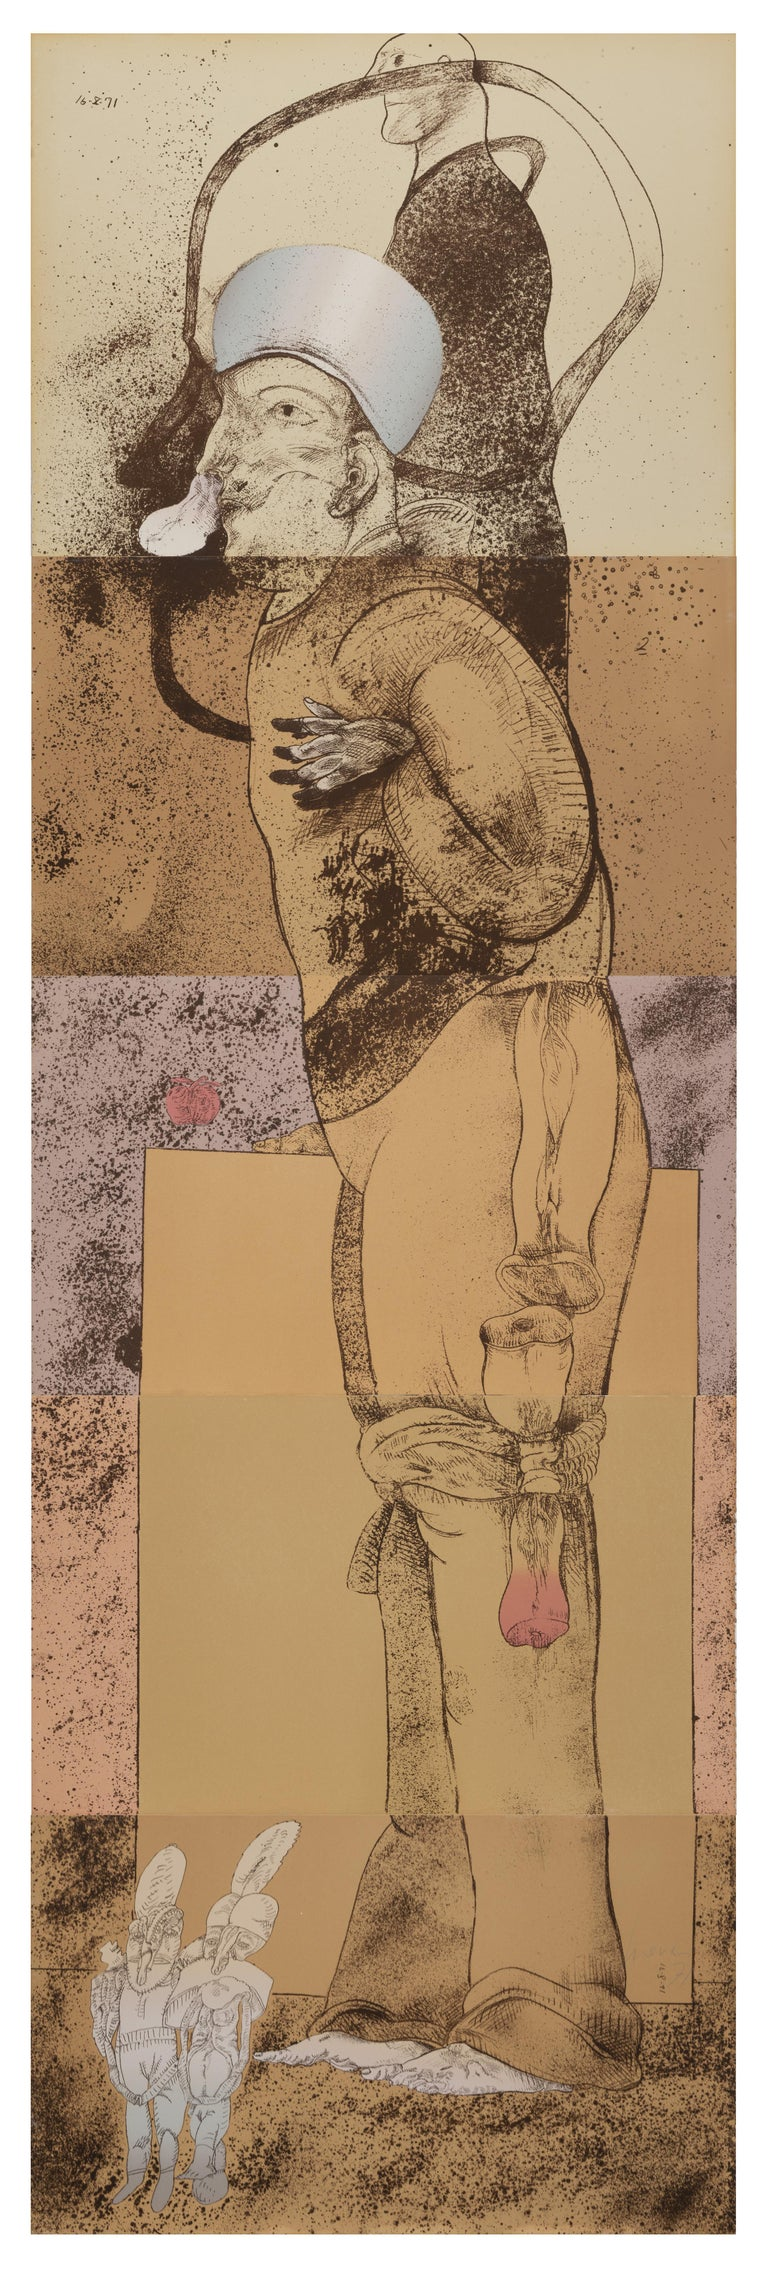 José Luis Cuevas Figurative Print - The Giants